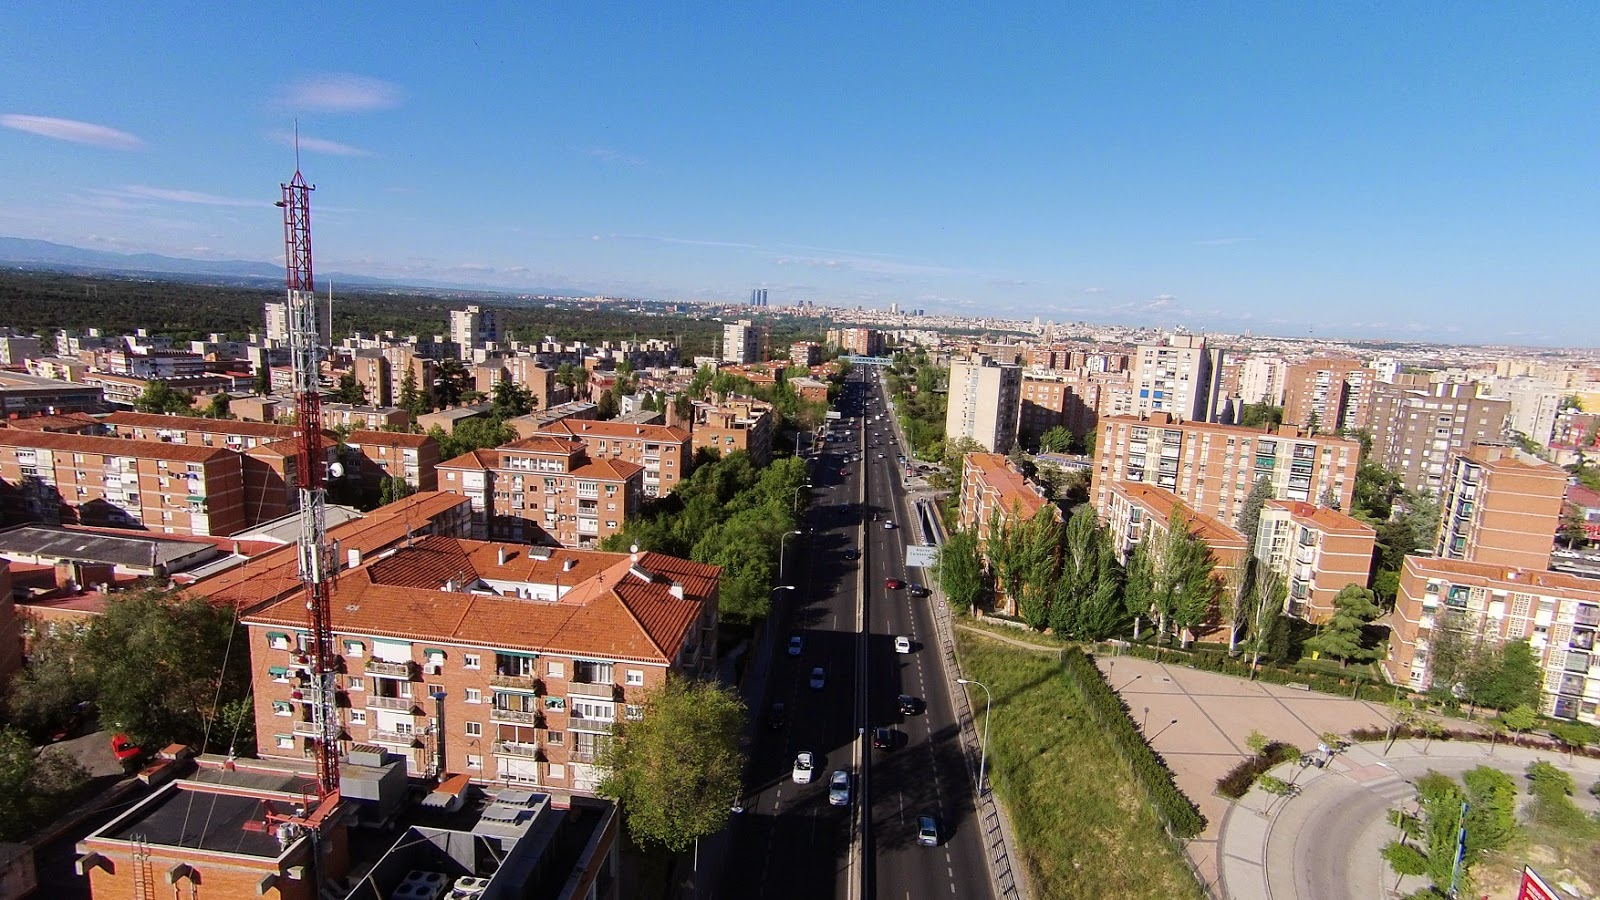 Aluche a vista de drone gu a de aluche for Oficina de extranjeria avenida de los poblados